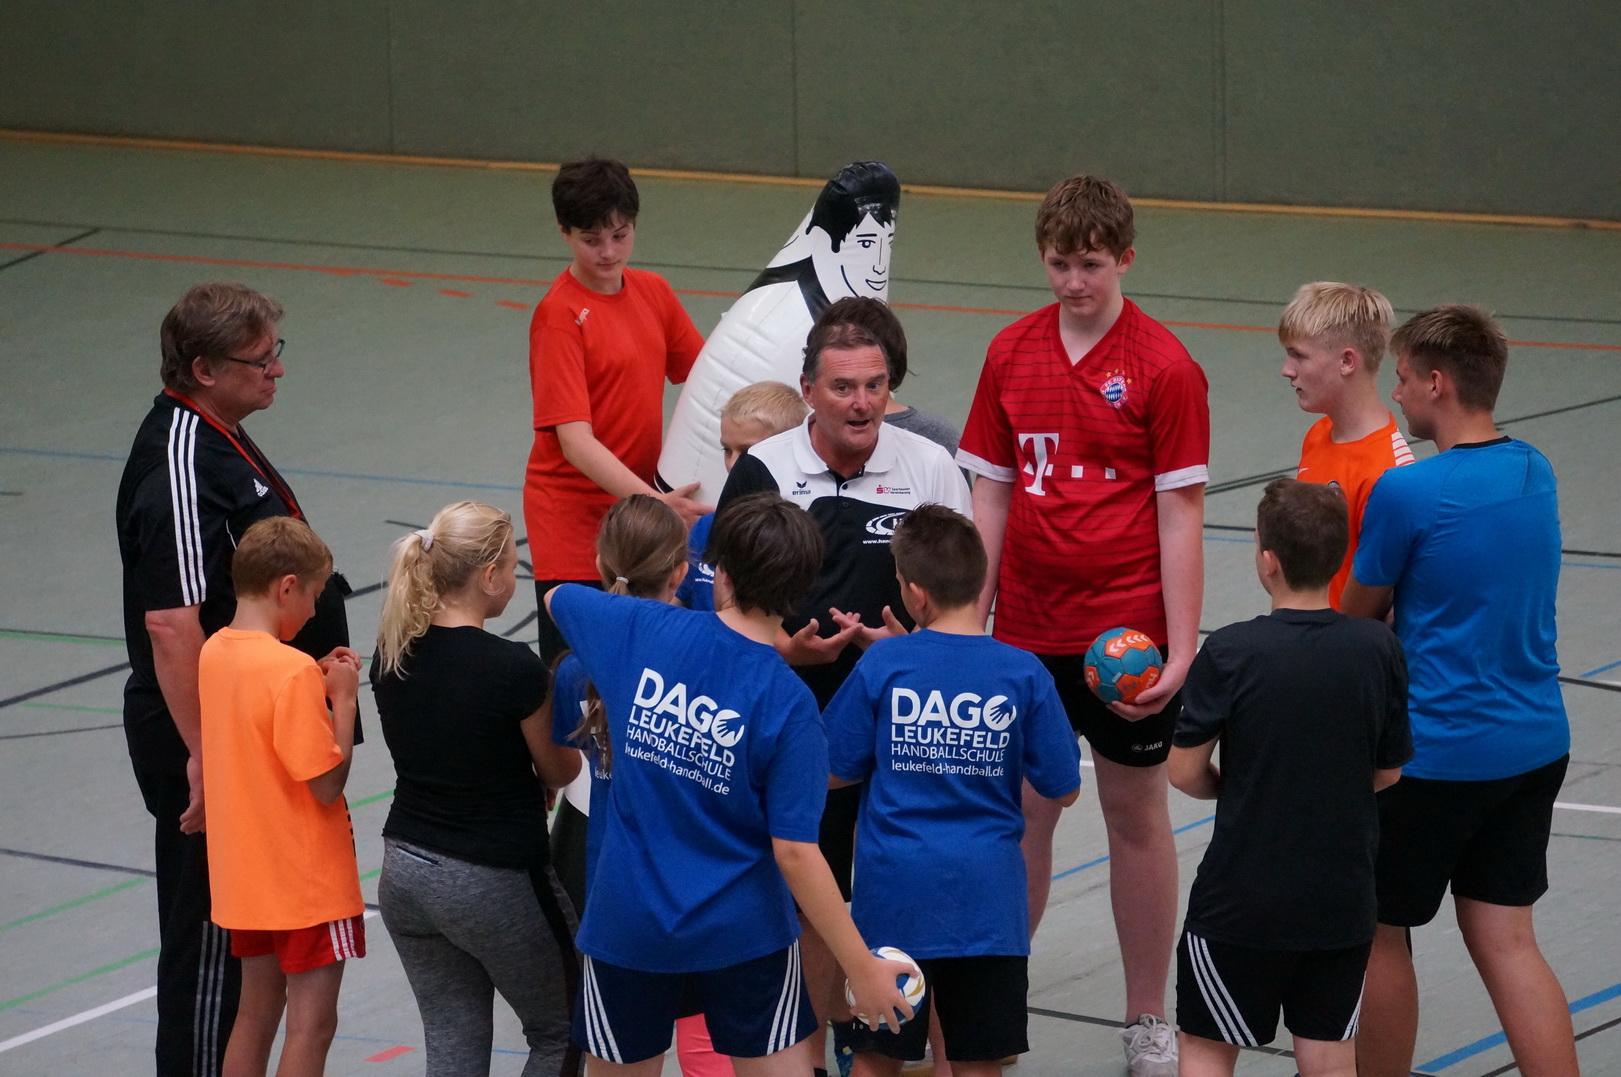 201808_Handballcamp_SDH_MG_232w